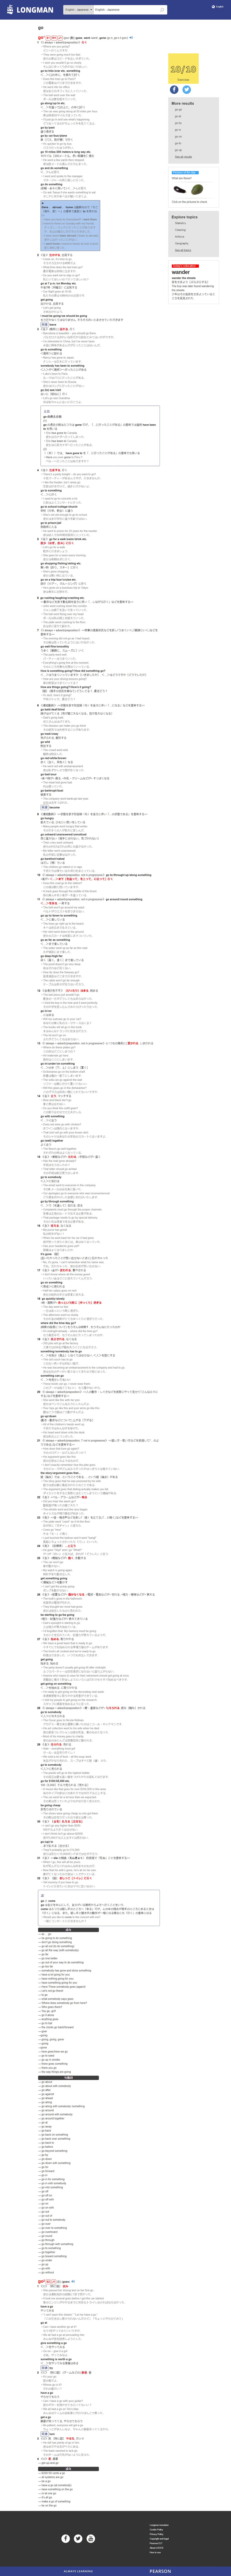 GitHub - dolanskurd/longman_english-japanese: Longman